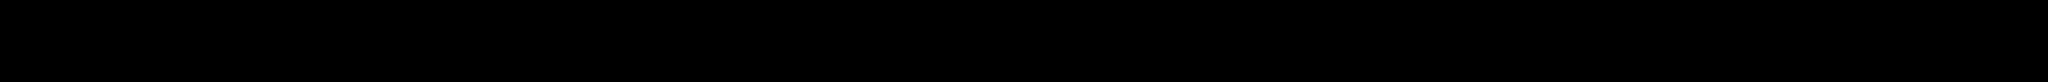 UTAL Rekisterikilven aluslevyt